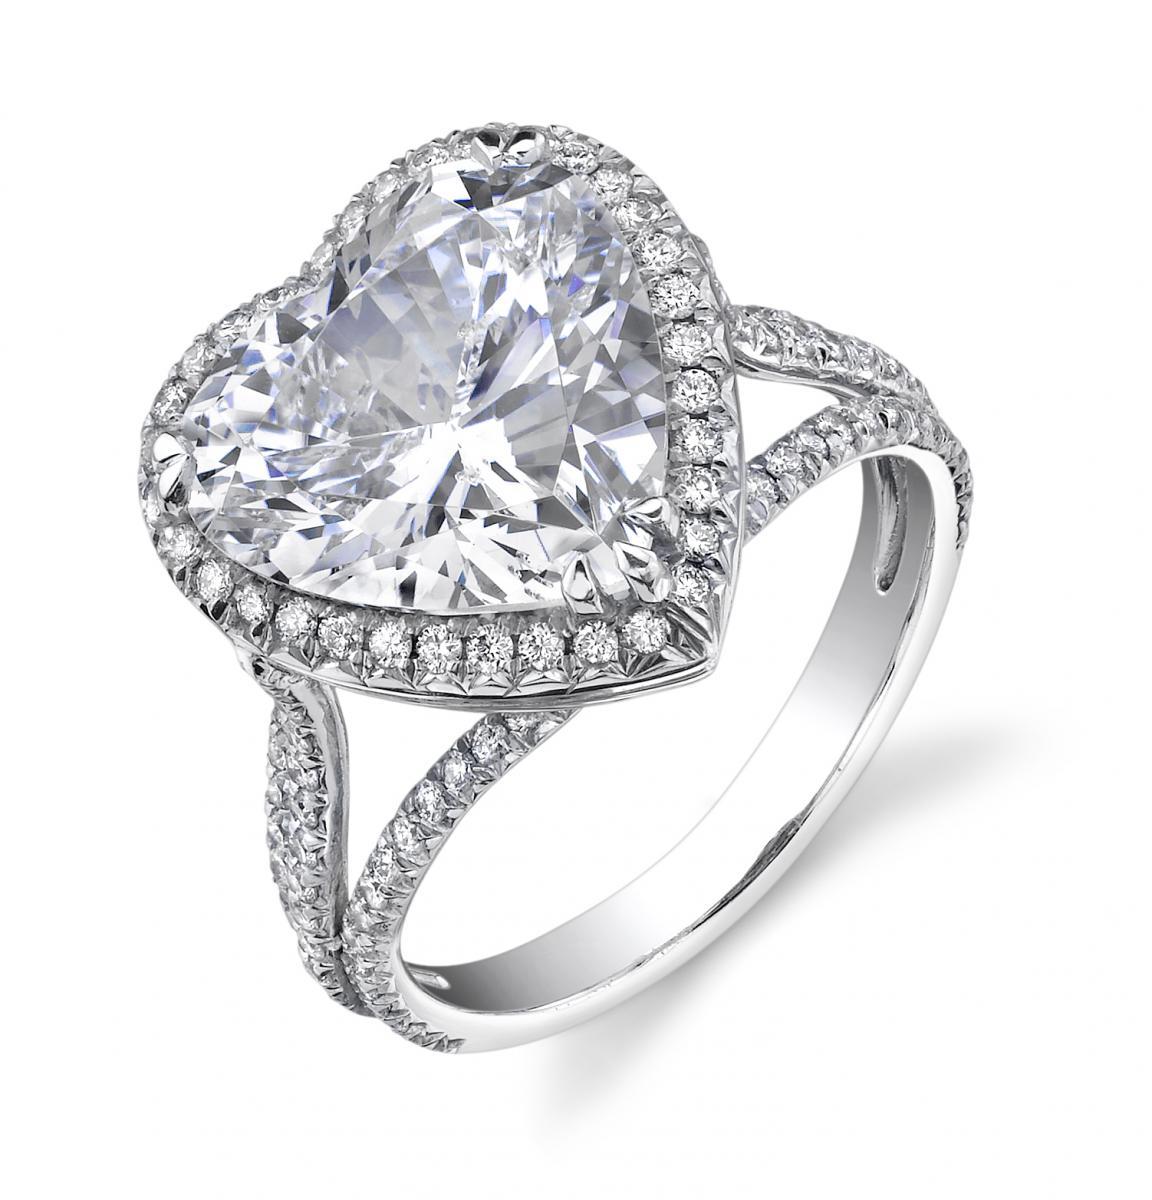 7 Creative Ideas for Custom Engagement Rings